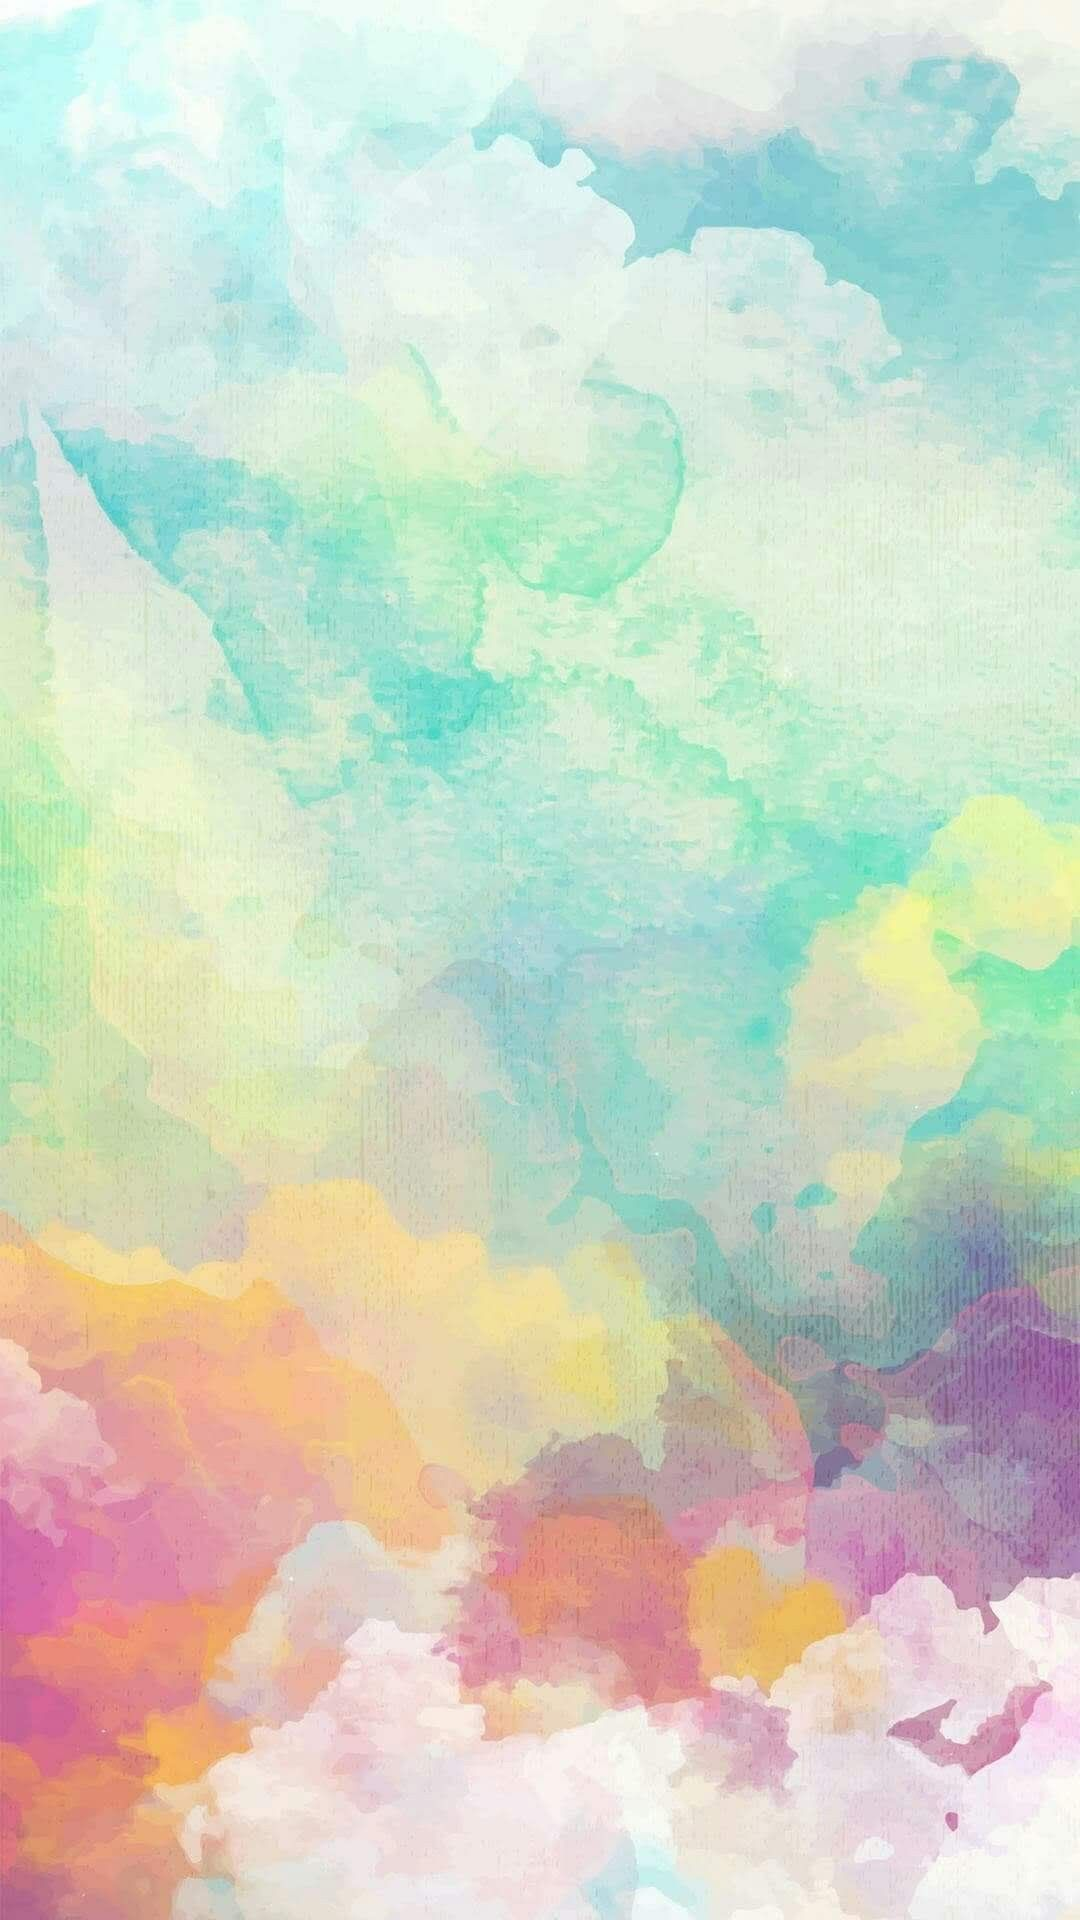 Aesthetic Wallpaper Watercolor Wallpaper Cute Pastel Wallpaper Pastel Background